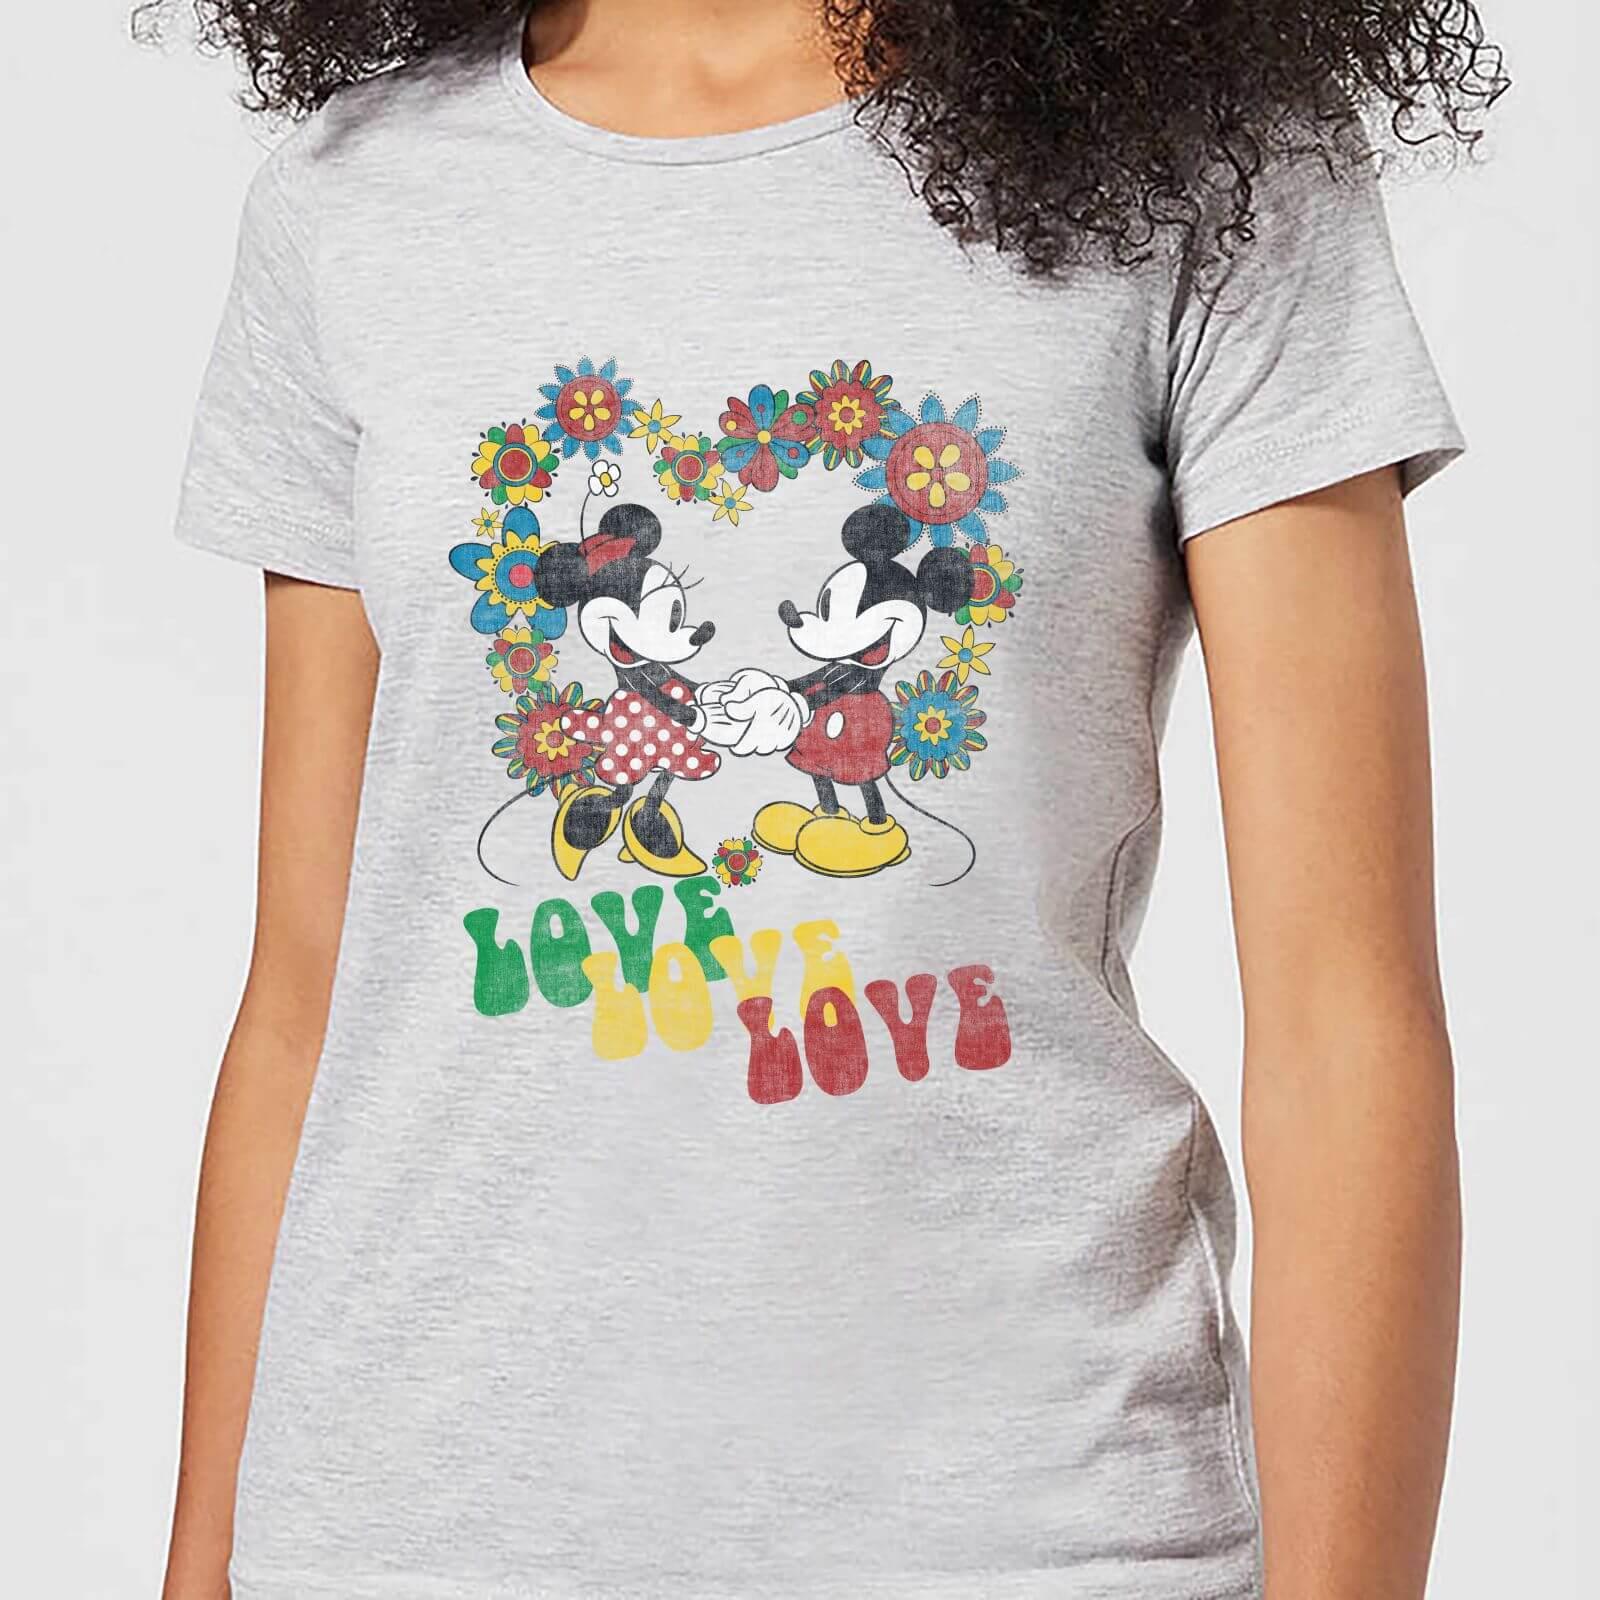 Disney Mickey Mouse Hippie Love Women's T-Shirt - Grey - 4XL - Grey